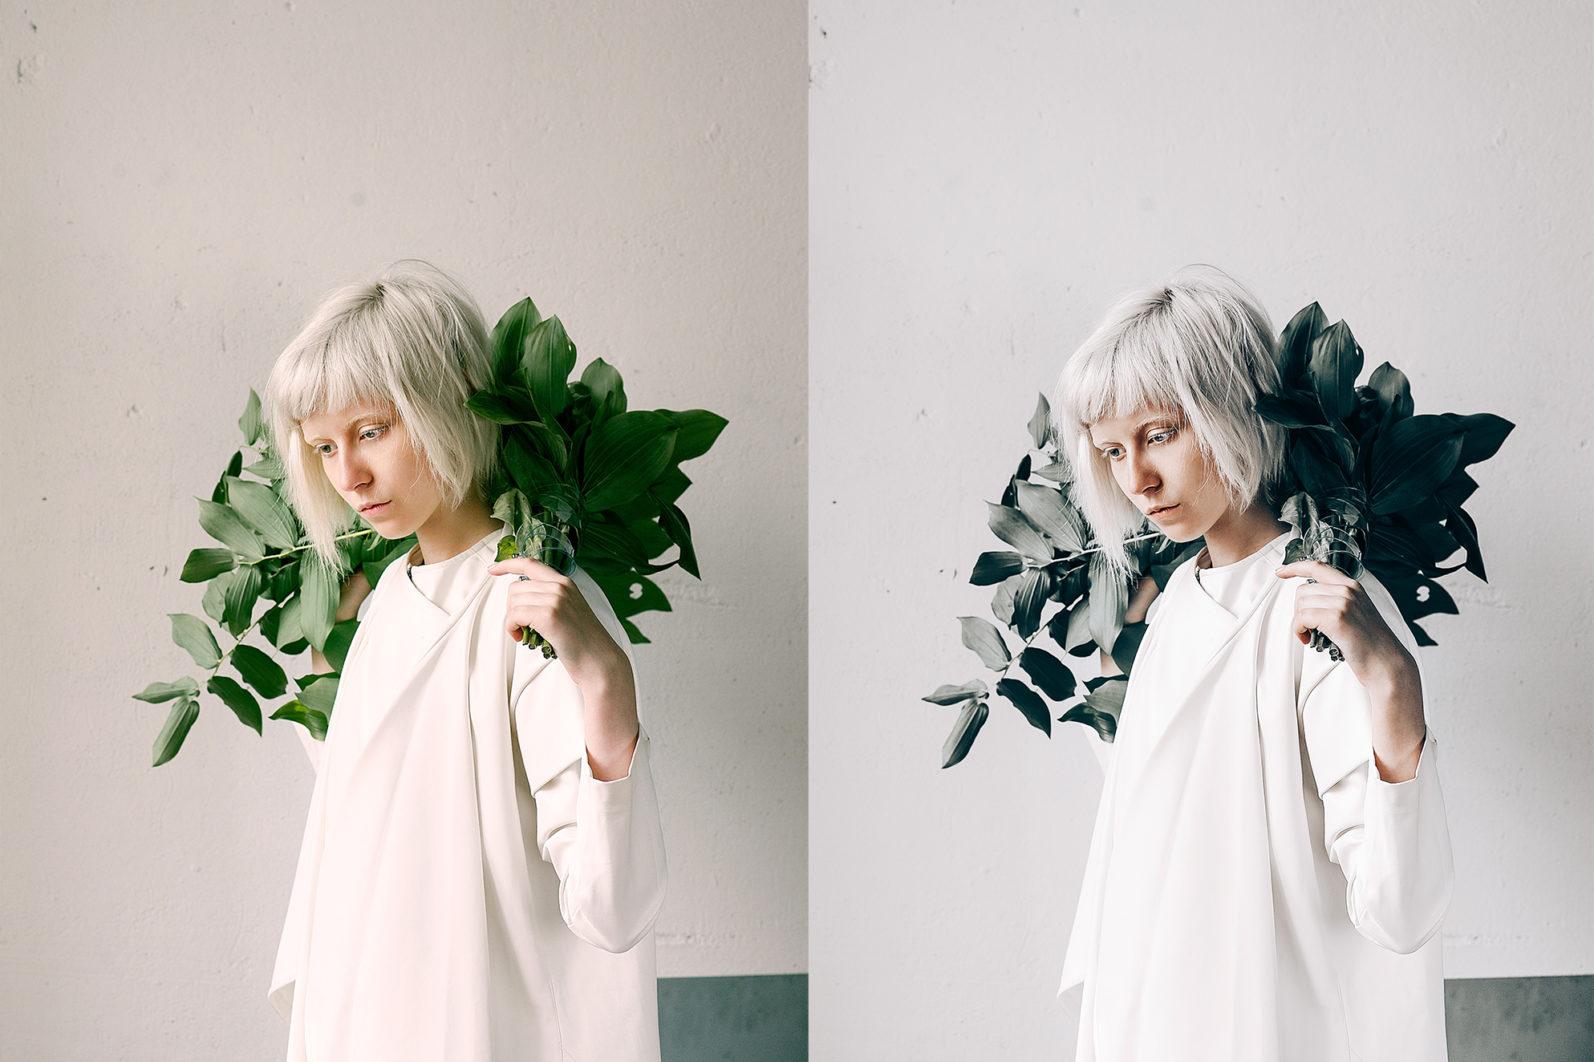 12 x Lightroom Presets | Minimalistic White | Mobile + Desktop - 2 Minimalist White -